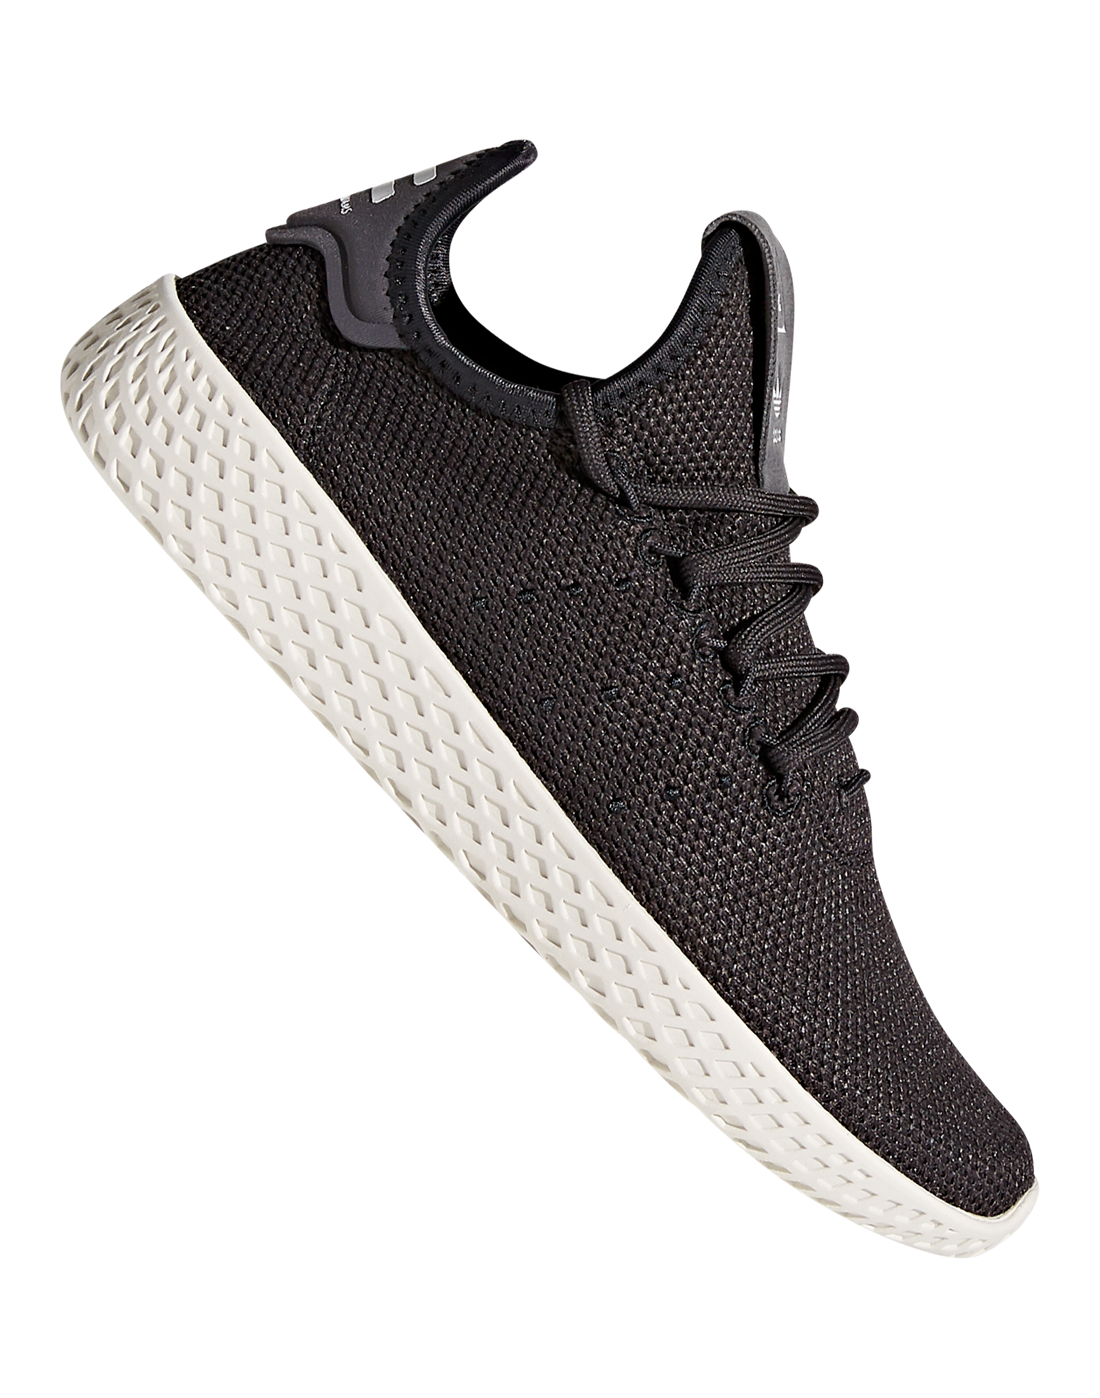 fcf10a21f66c4 adidas Originals Boys Pharrell Williams Tennis Hu